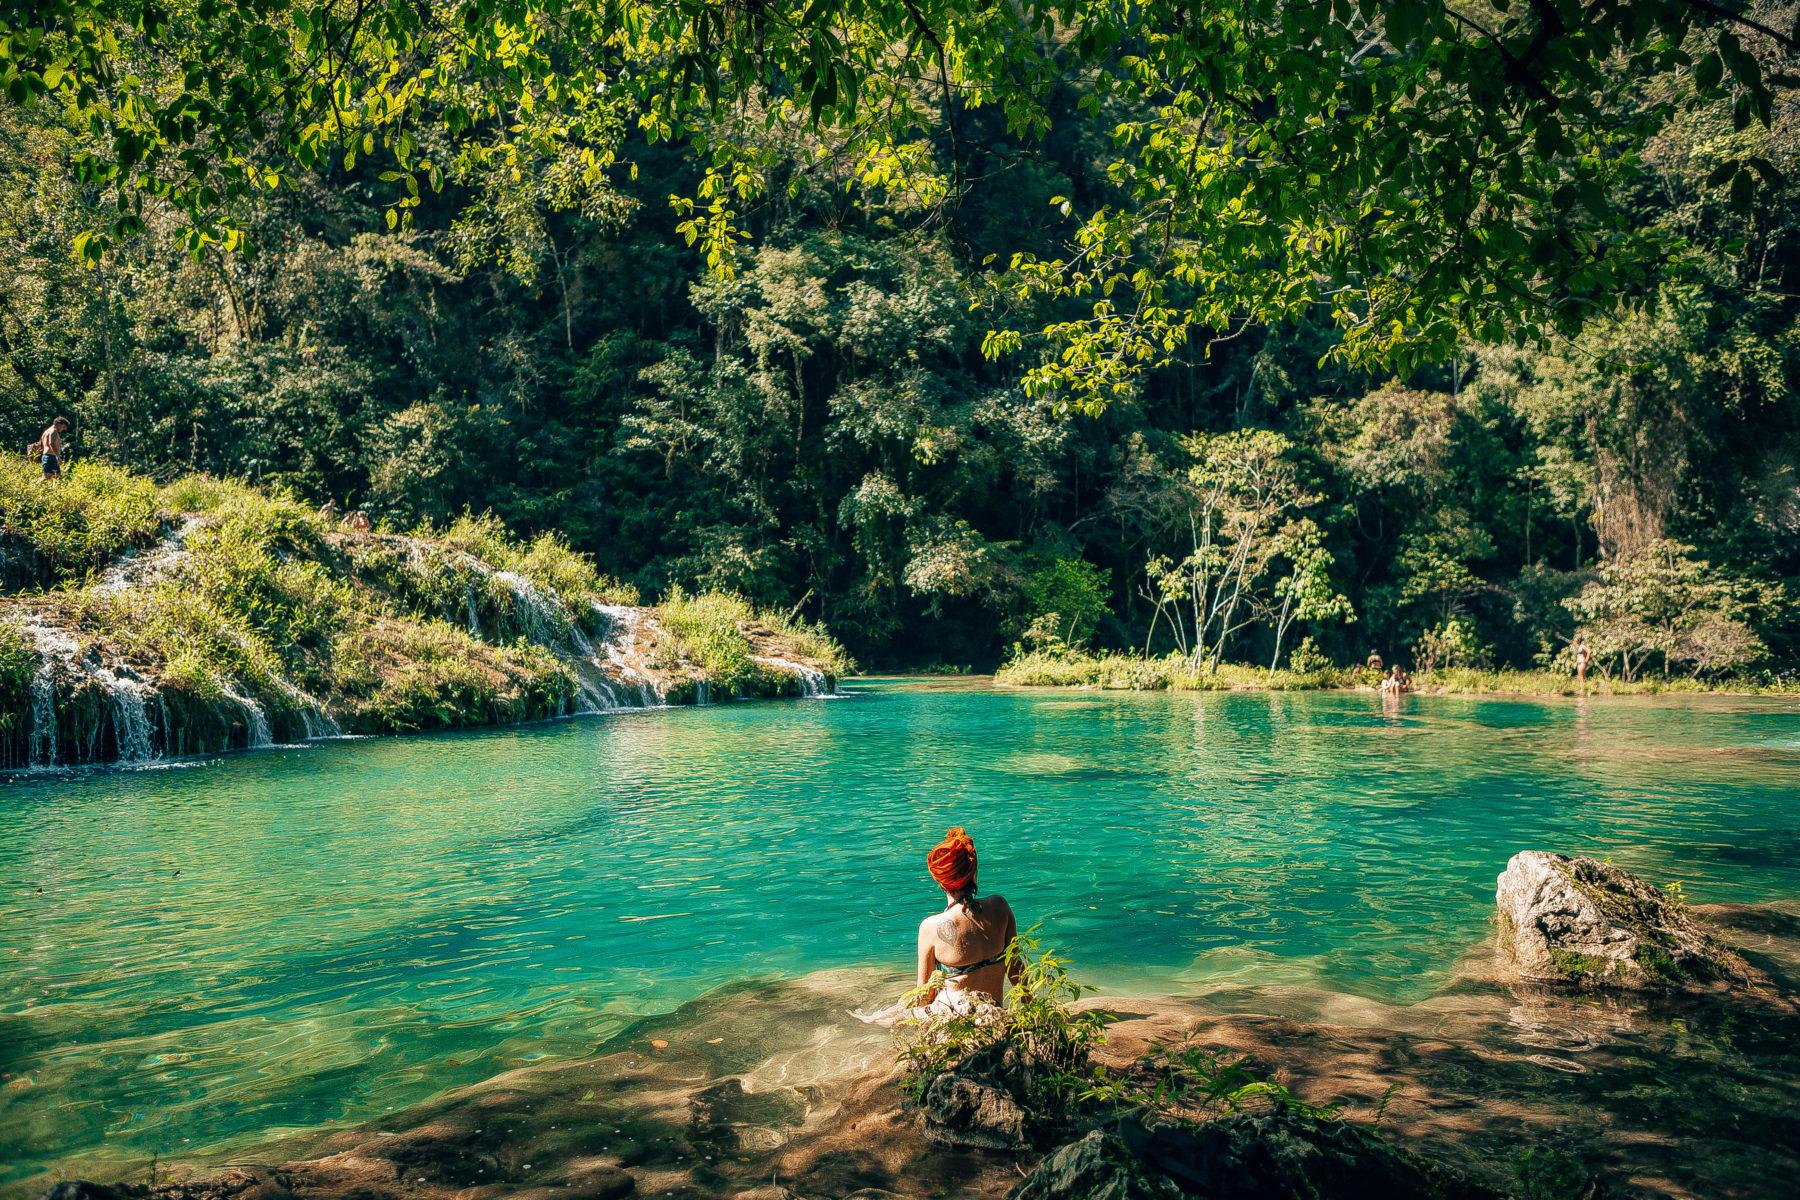 guatemala semuc champey turquoise pools jungle green humid swim adventure far away hidden paradise el retiro lodge in the jungle cacao pure natural pools tropics